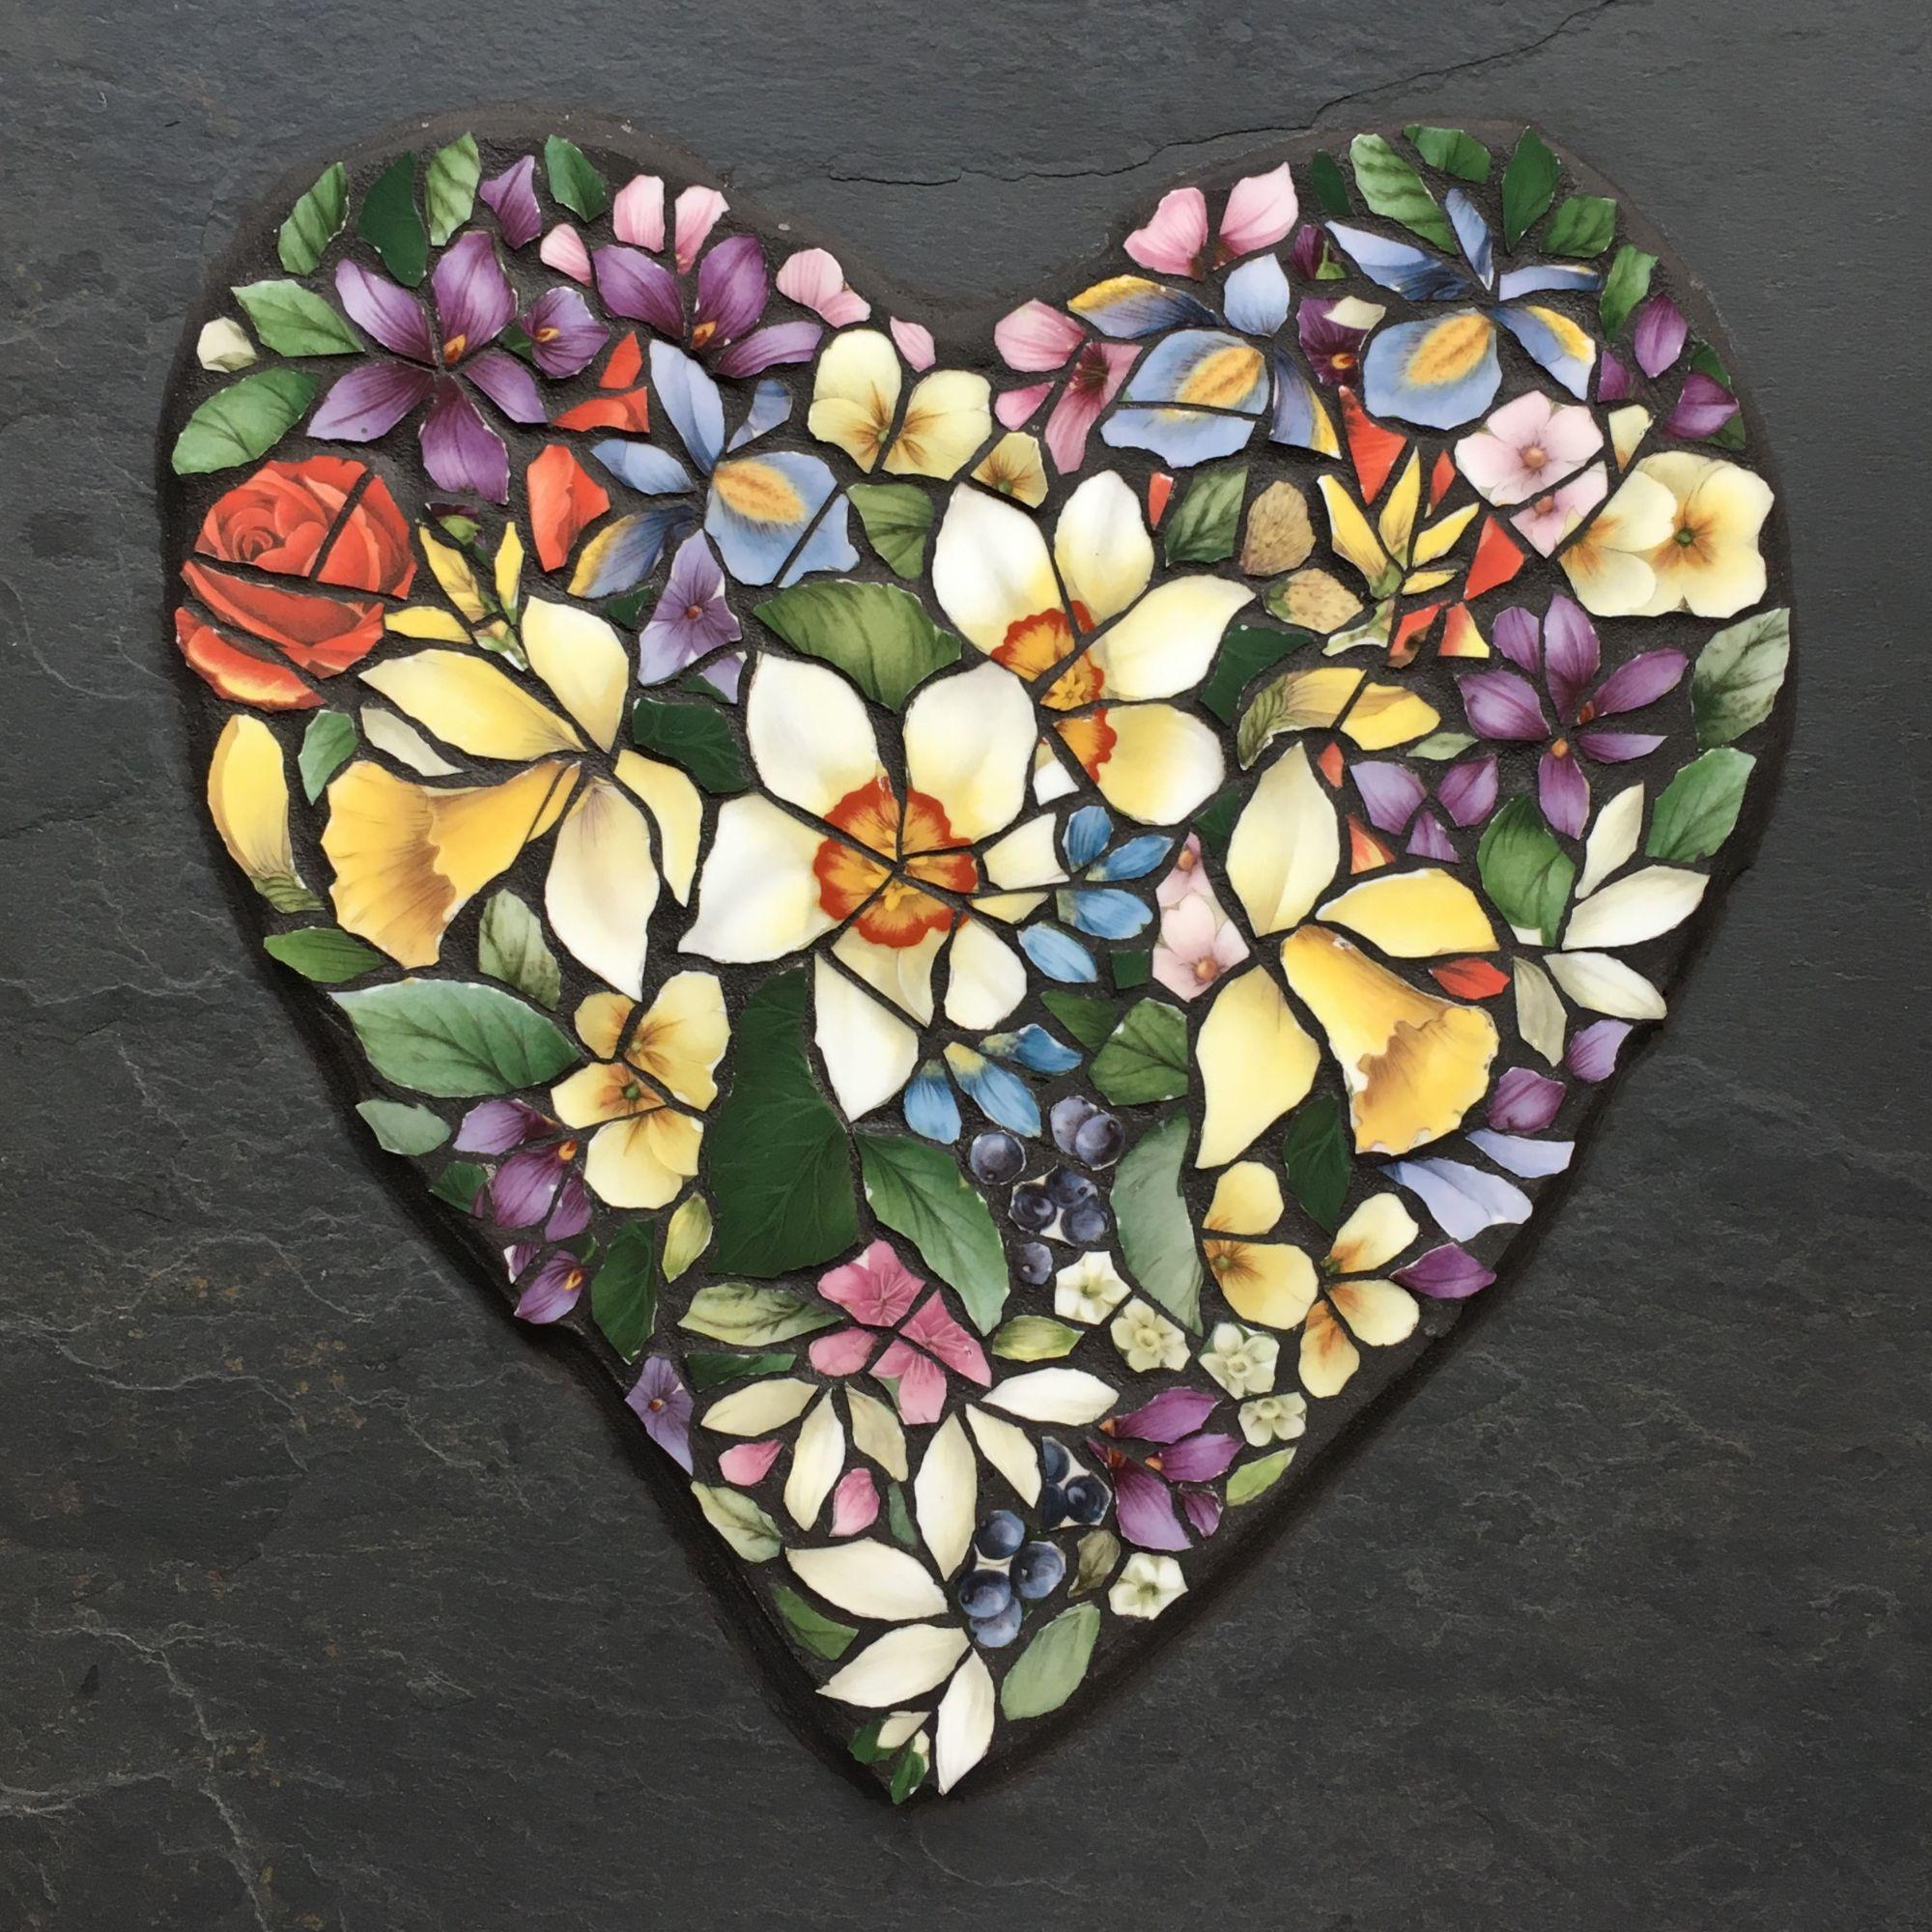 Crockery Mosaic Workshop